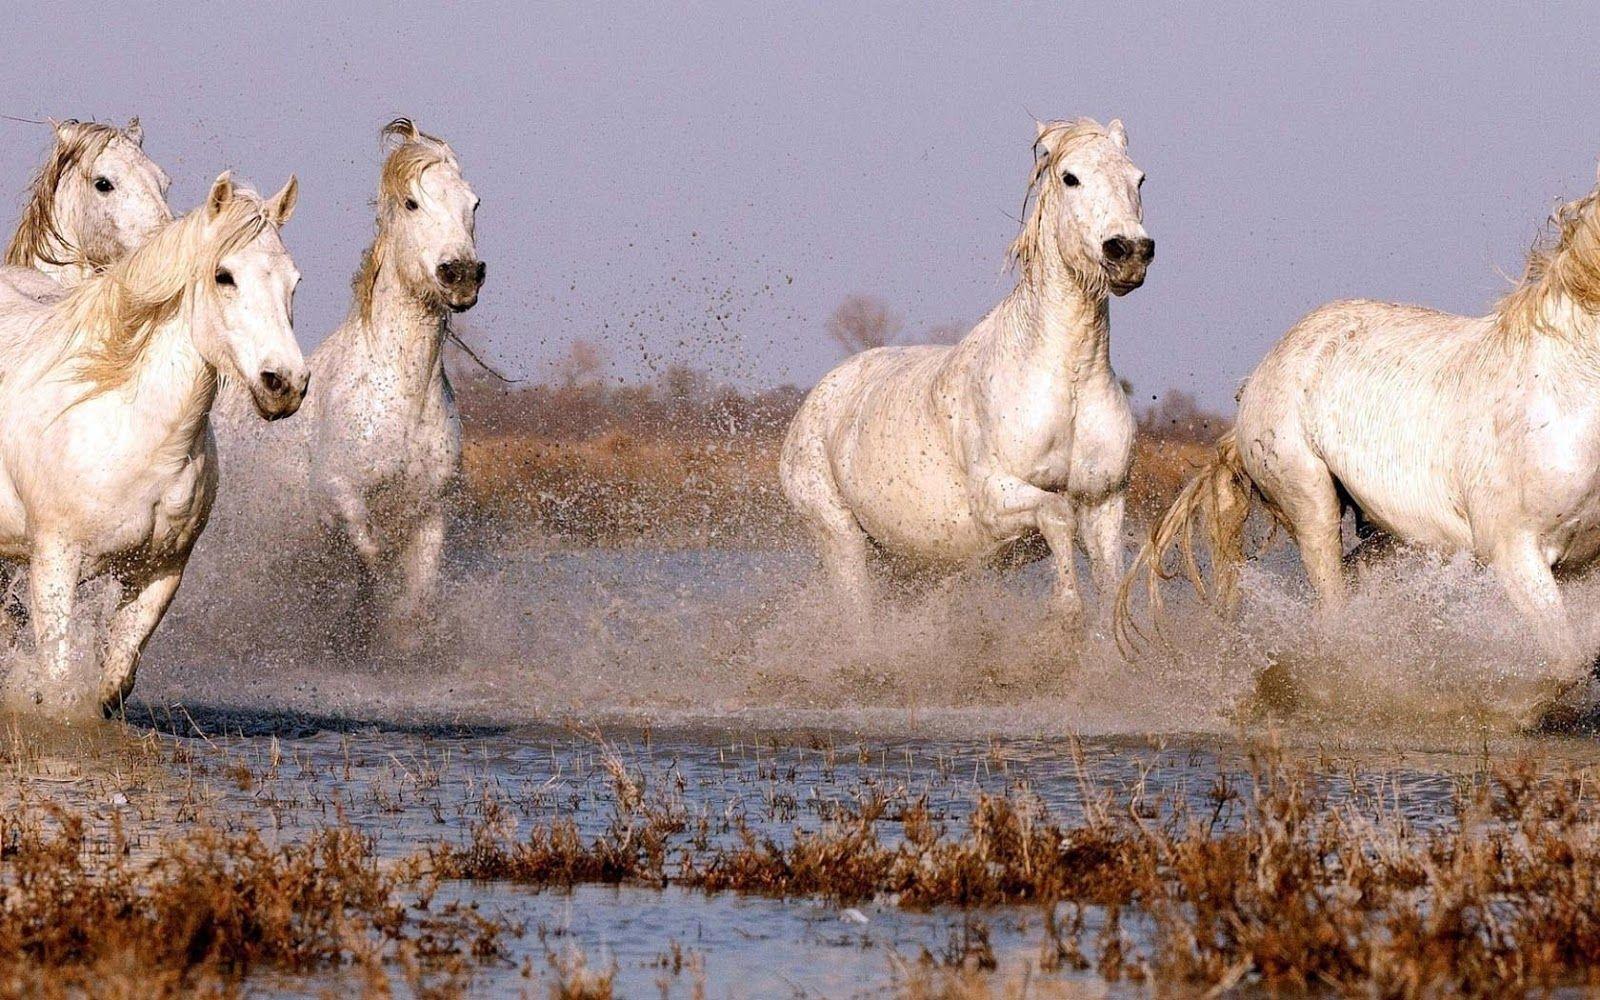 Horse Wallpaper For My Desktop Pc Laptop 38 Horse Wallpapers In Horses